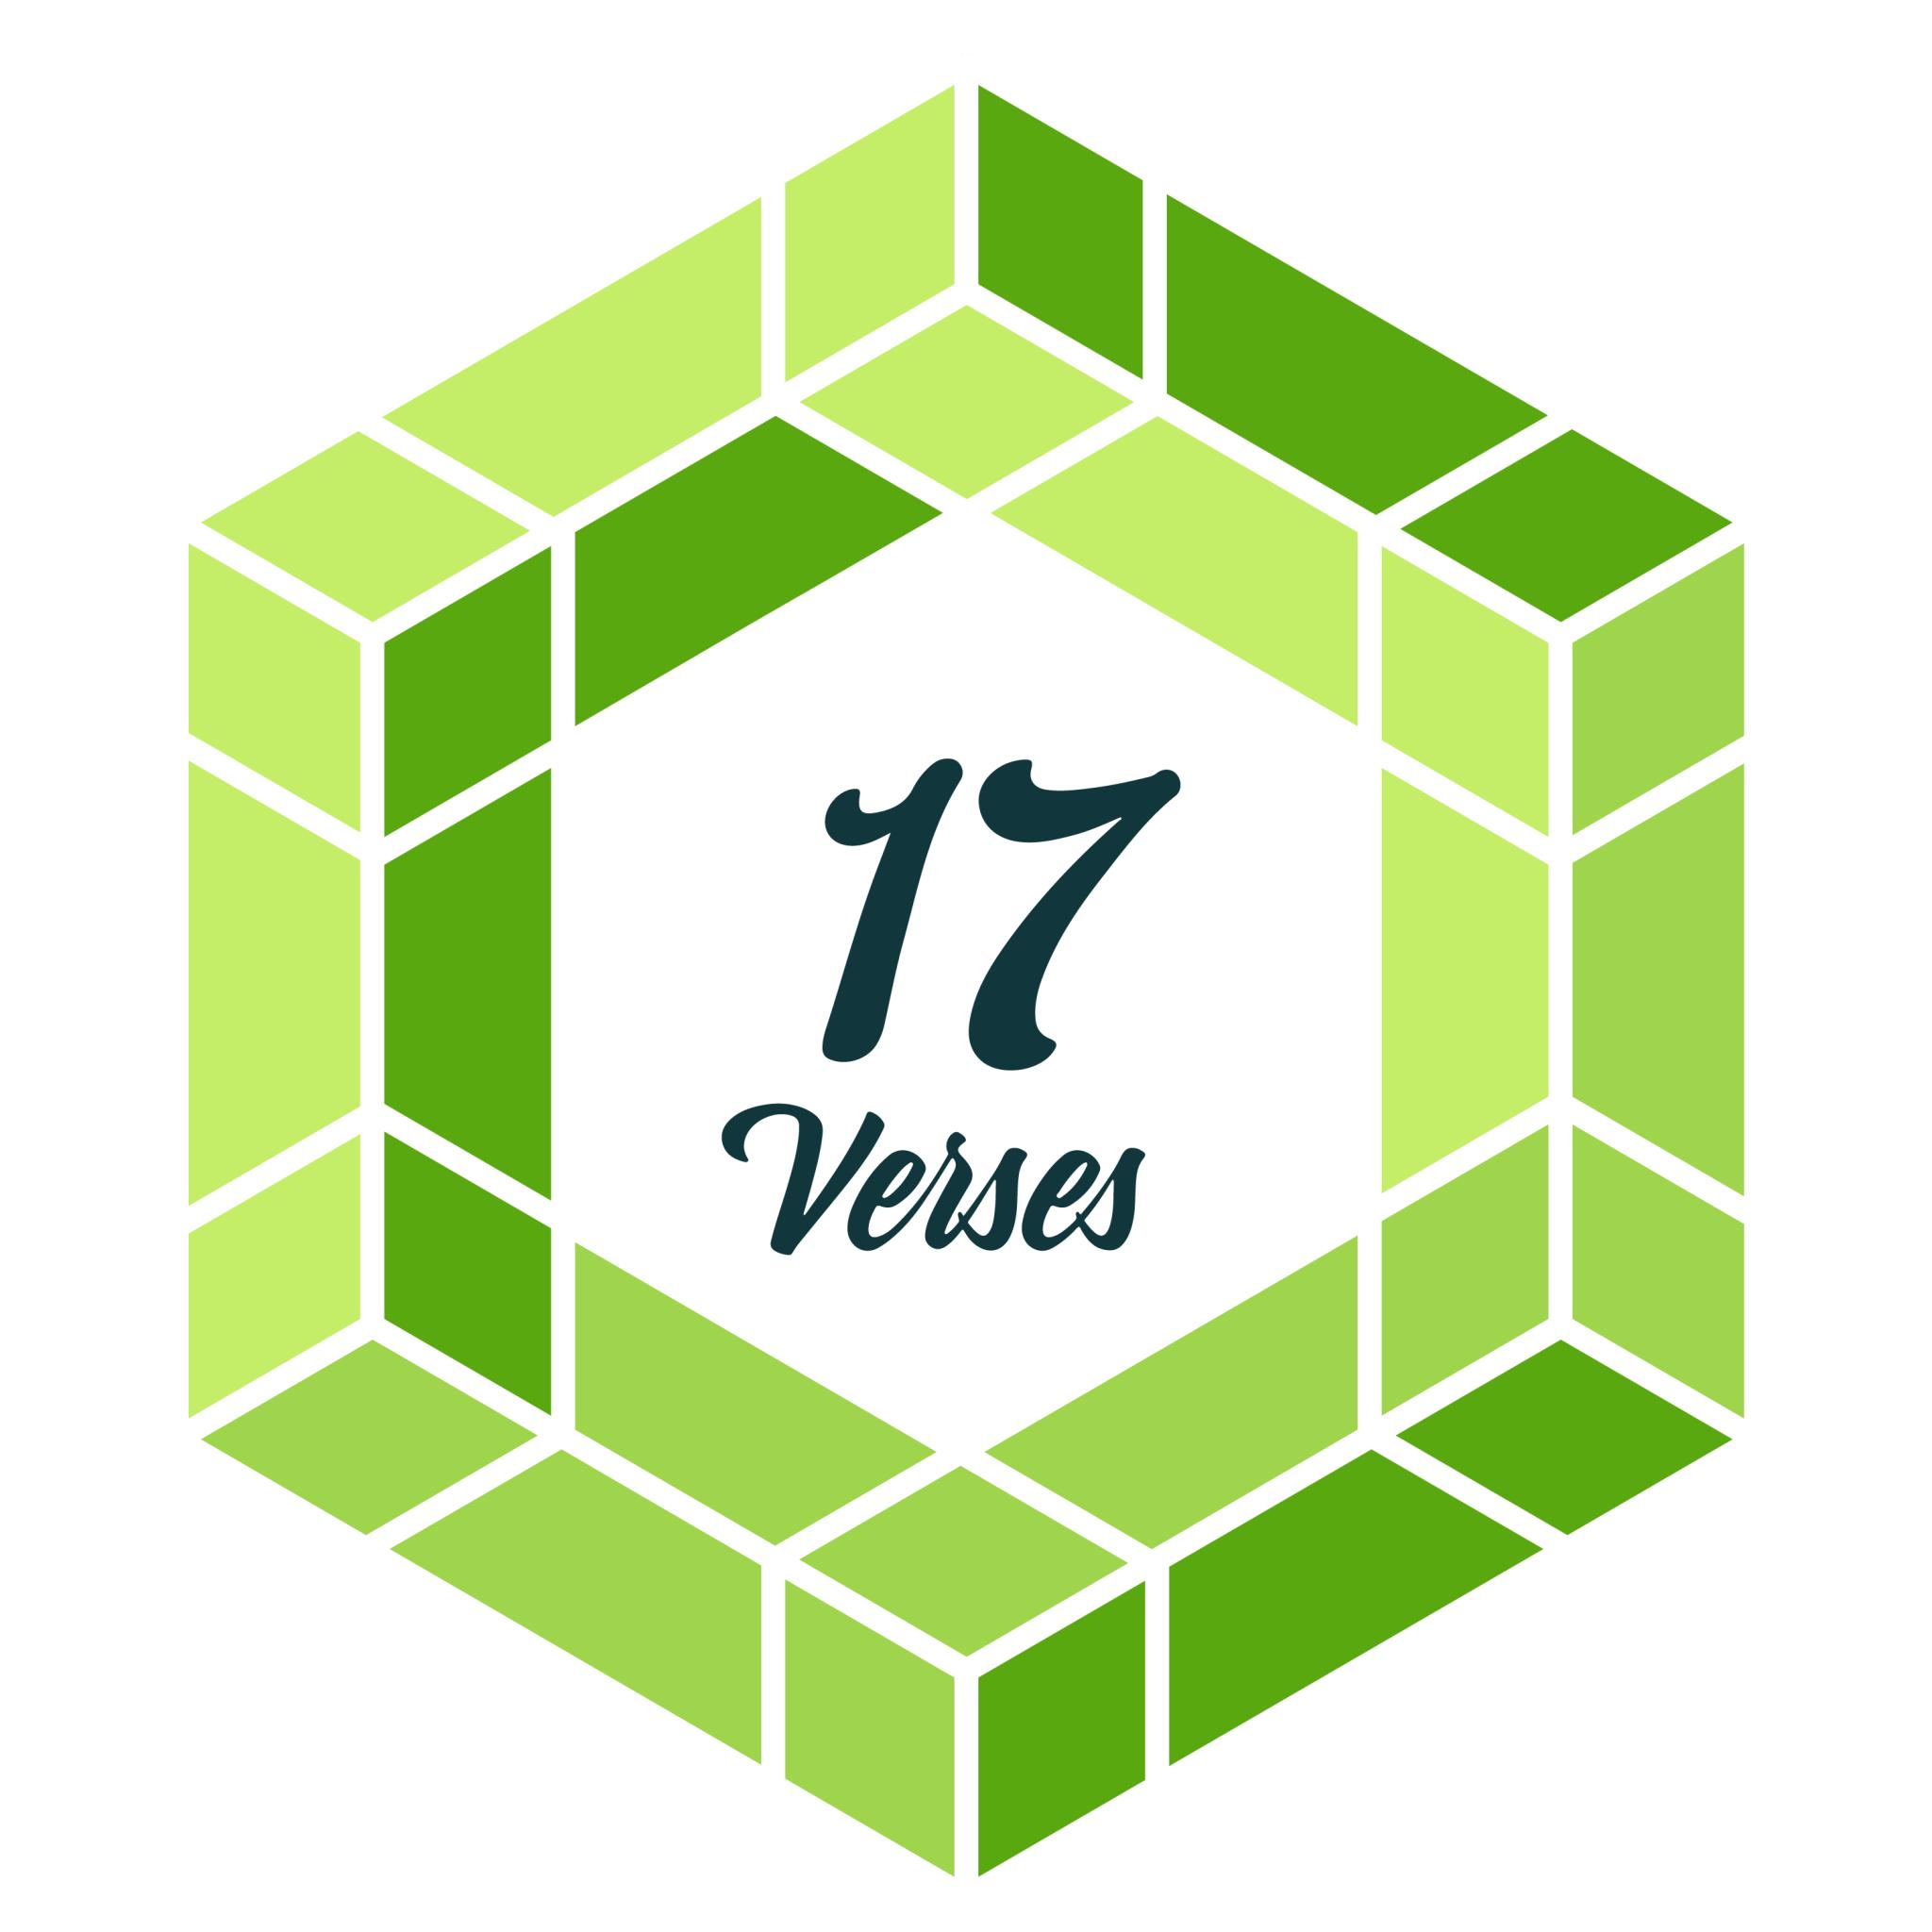 Year 2 - Surah 26 (Ash-Shu'arã), Verses 34-51